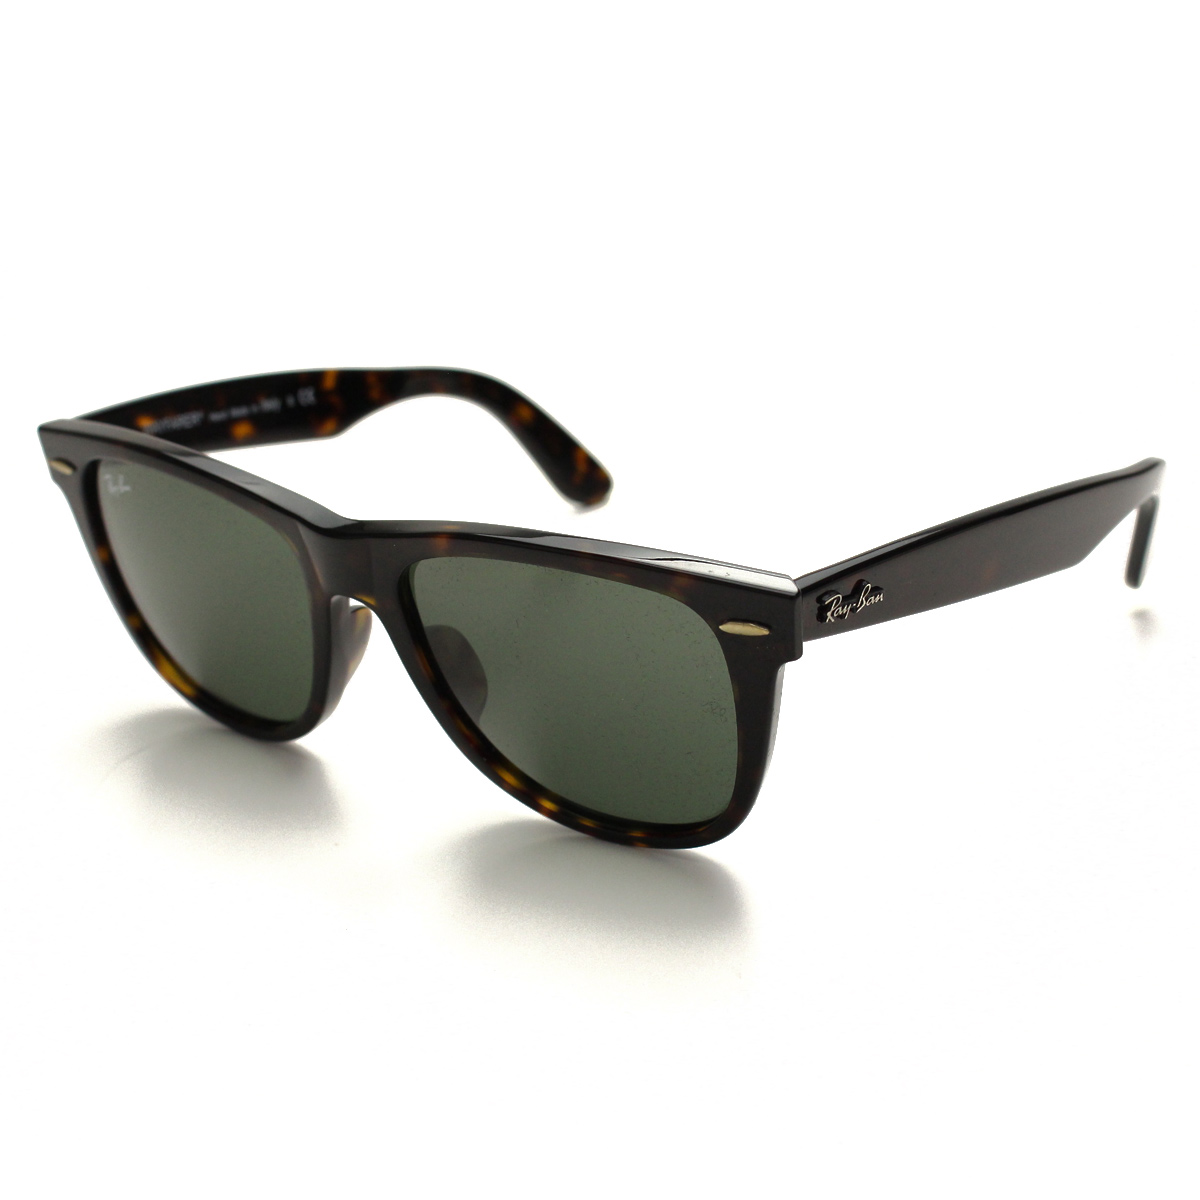 Cheap Ray Ban Sunglasses Philippines